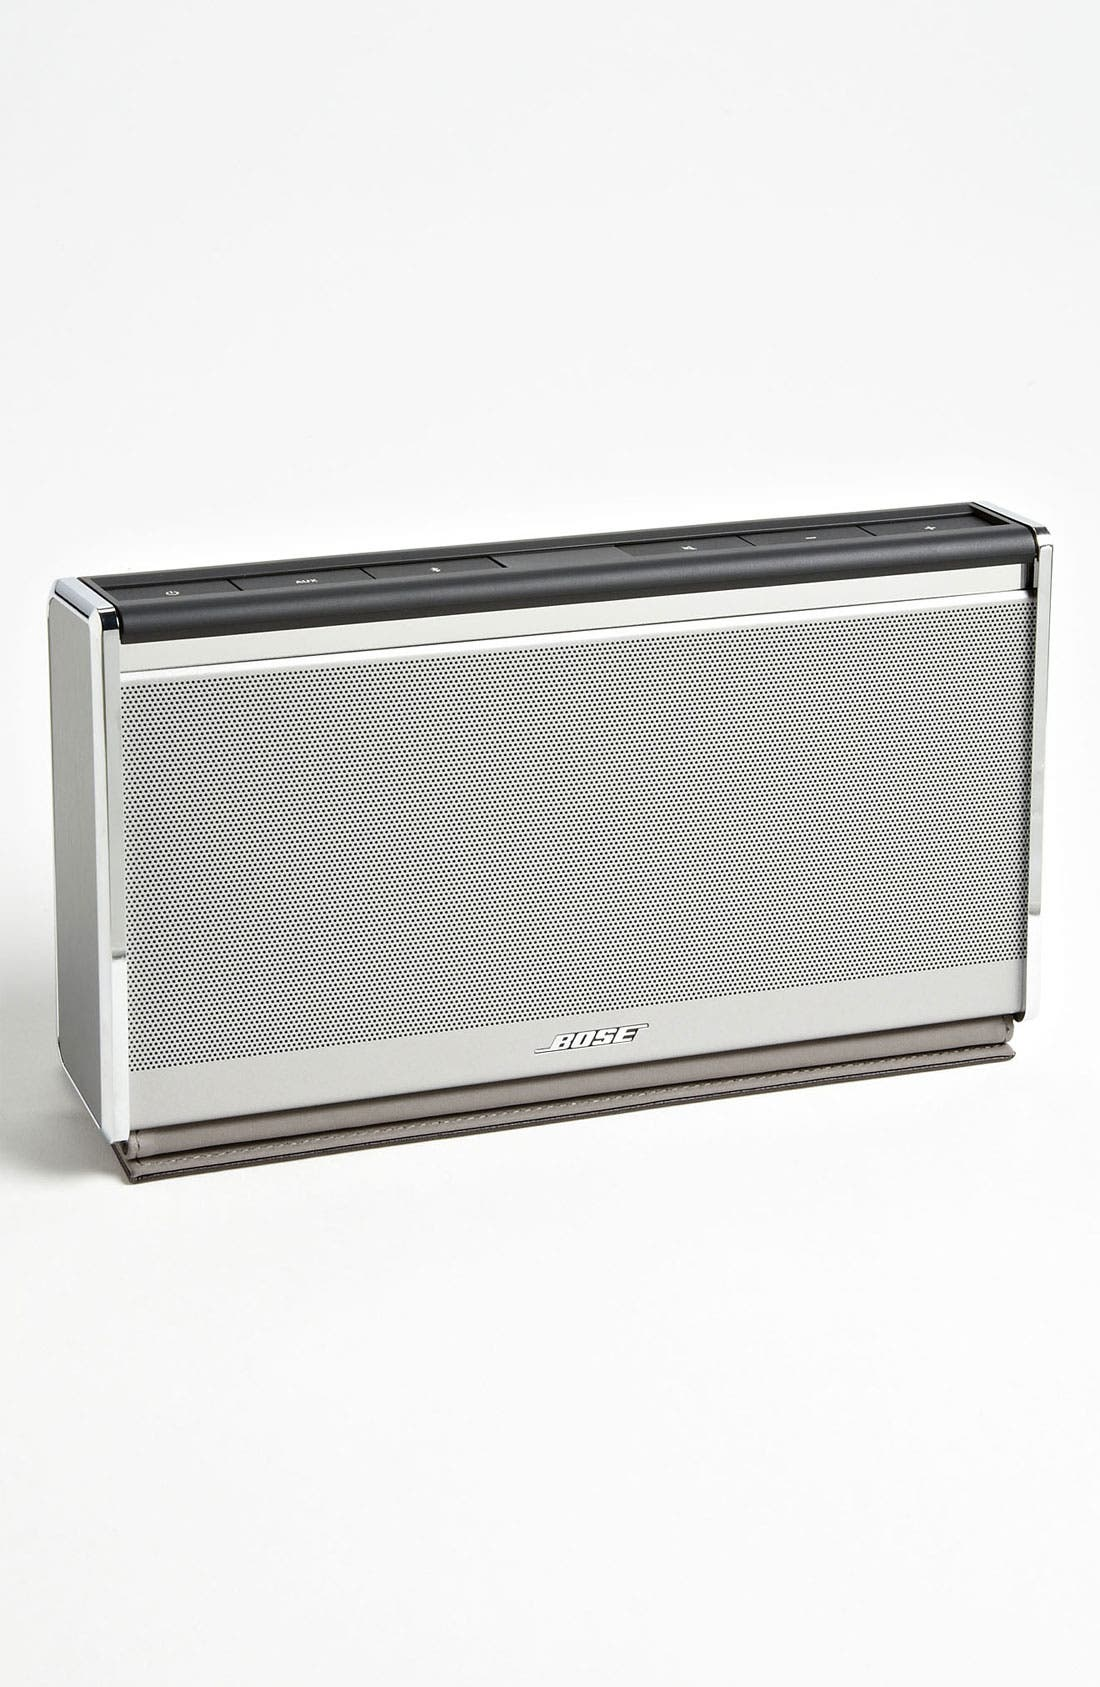 Alternate Image 1 Selected - Bose® SoundLink® Bluetooth® Mobile Speaker II – Leather Edition